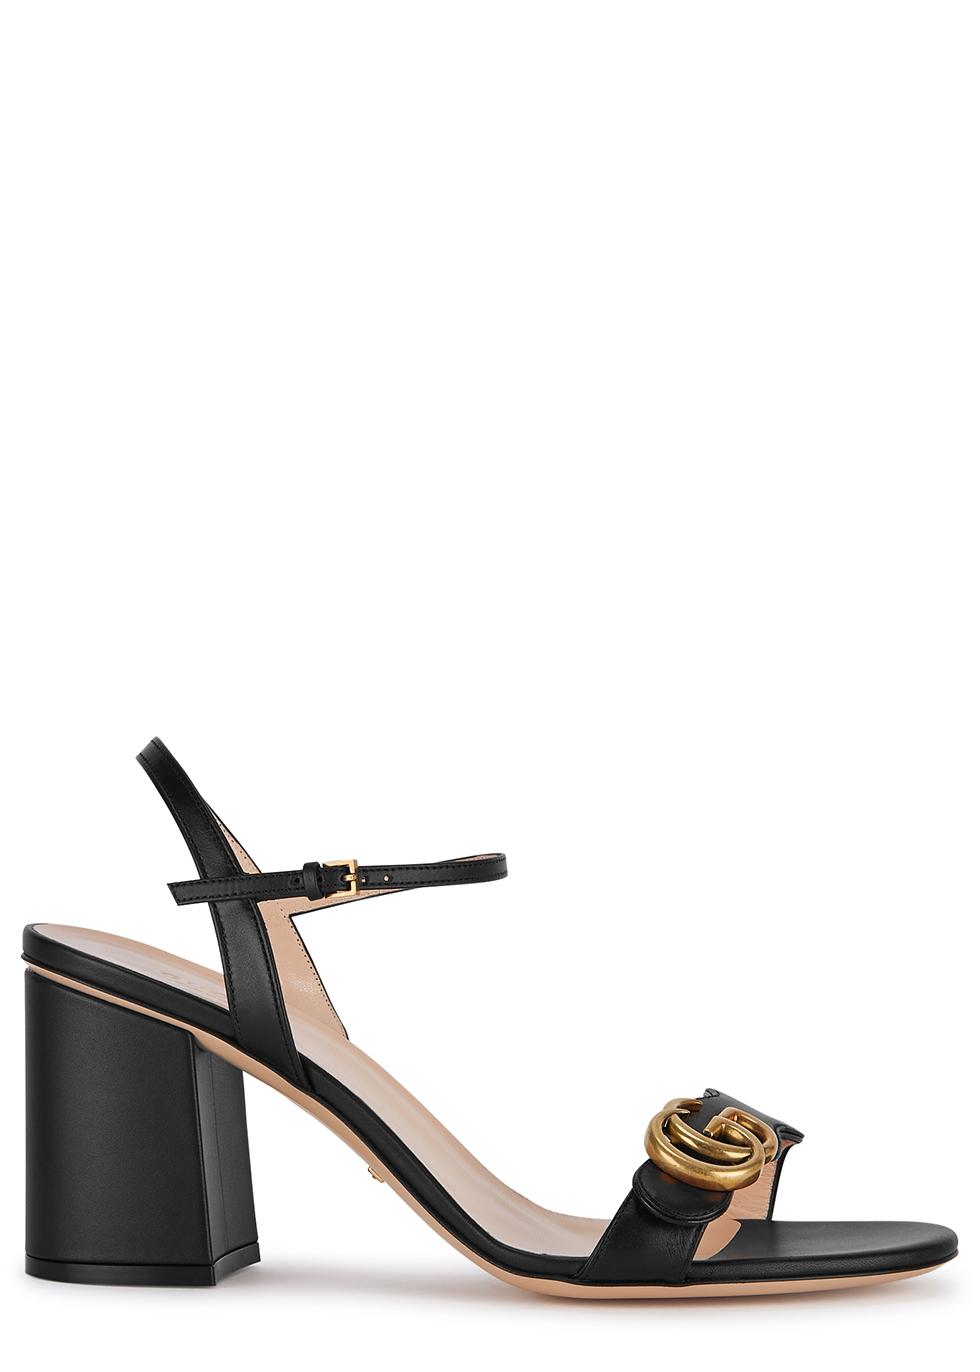 Women's Harvey Nichols Sandals Designer Women's IeW9DYEH2